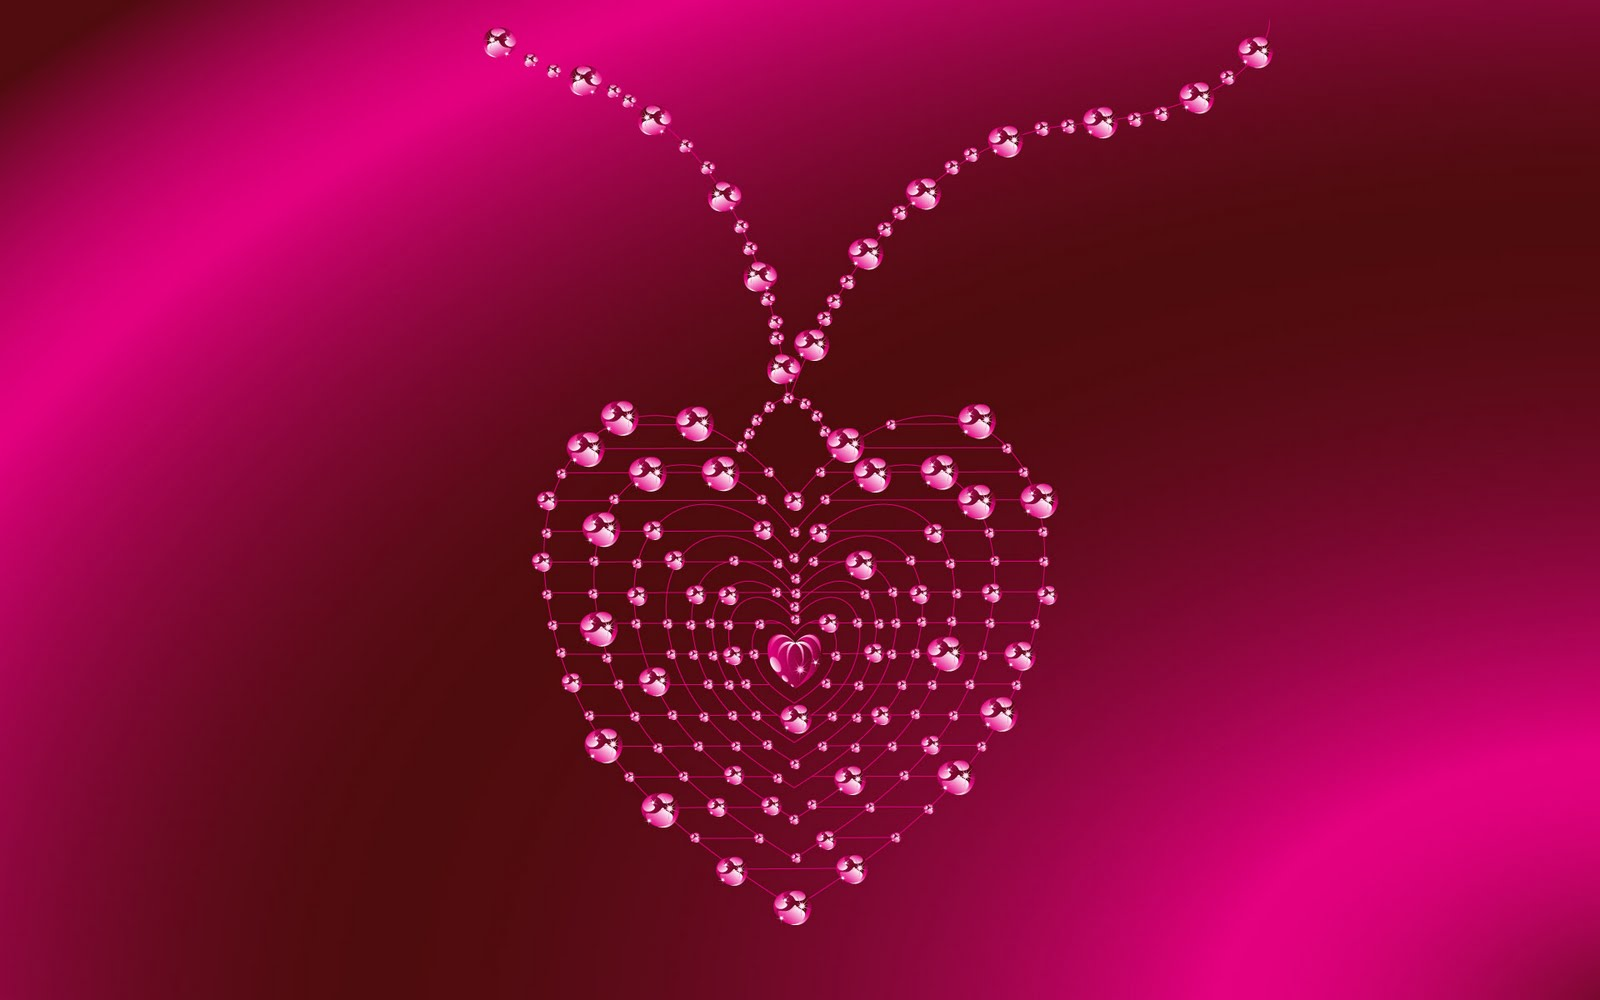 http://3.bp.blogspot.com/-y0ZFClkZZvU/TmaLTMXLEOI/AAAAAAAABa4/ZSrYBuV-ksU/s1600/Heart_+%252813%2529.jpg